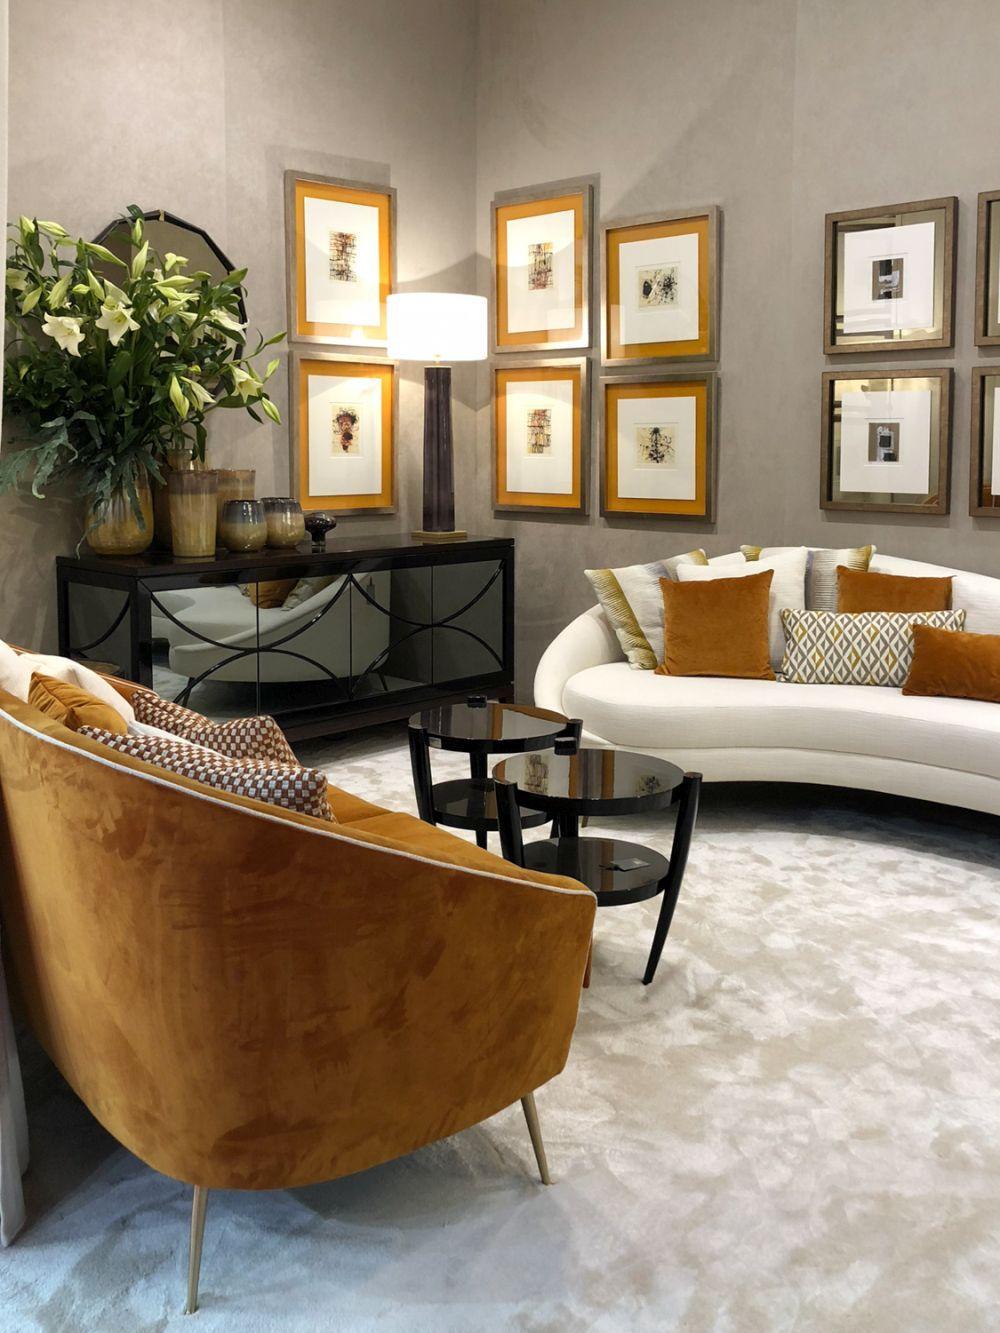 10 Corner Decoration Ideas That Actually Make Sense